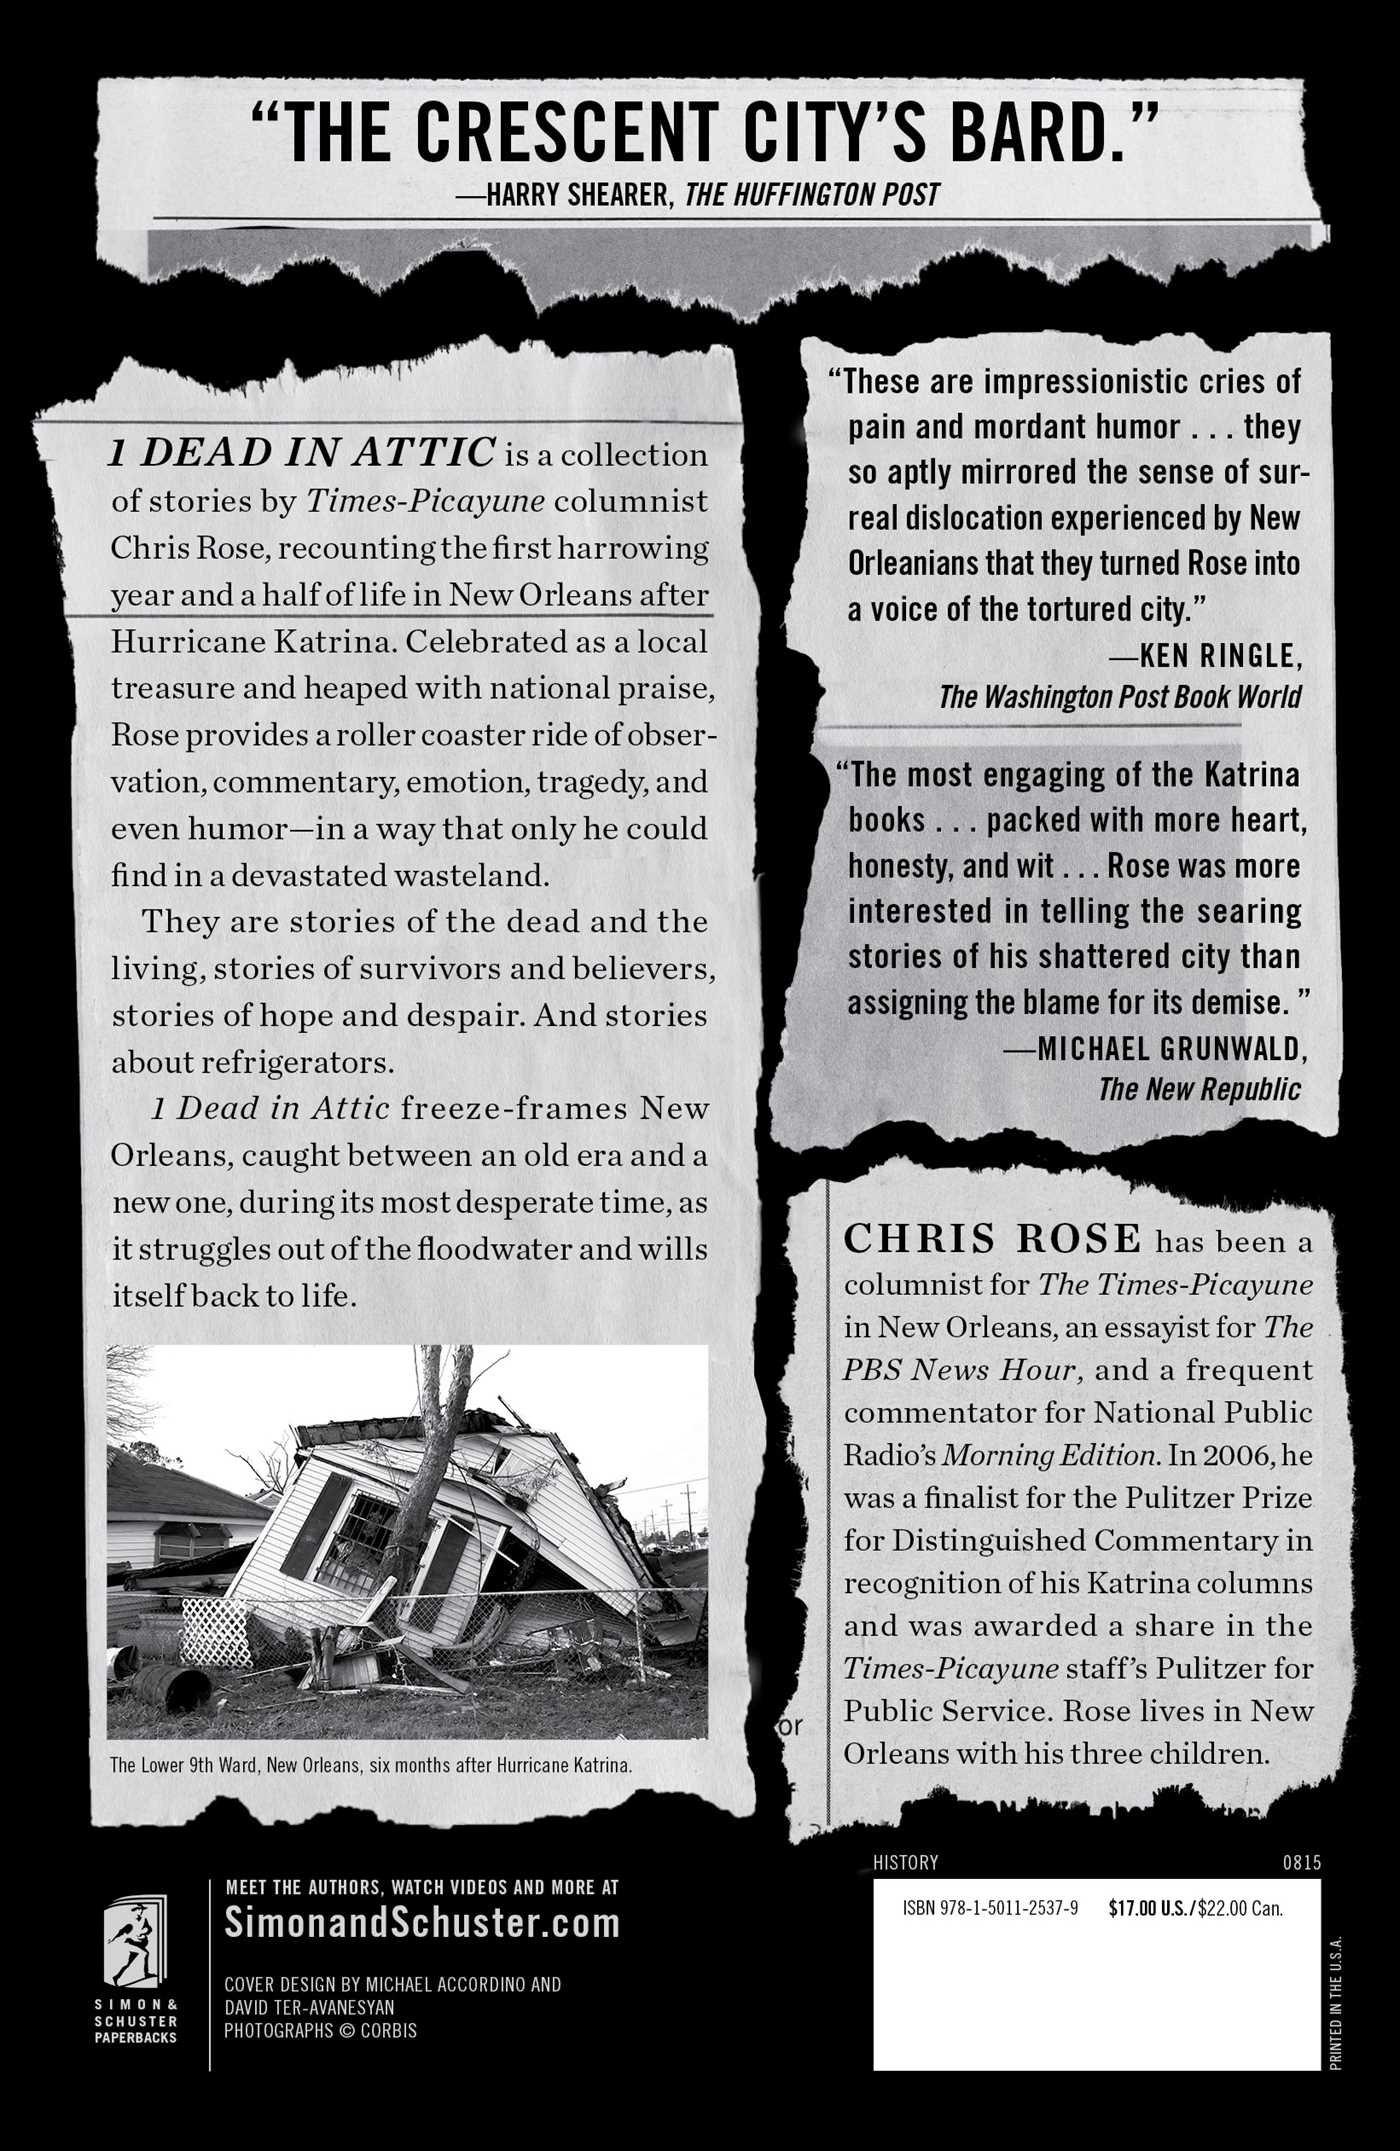 1 dead in attic after katrina chris rose 9781501125379 amazon